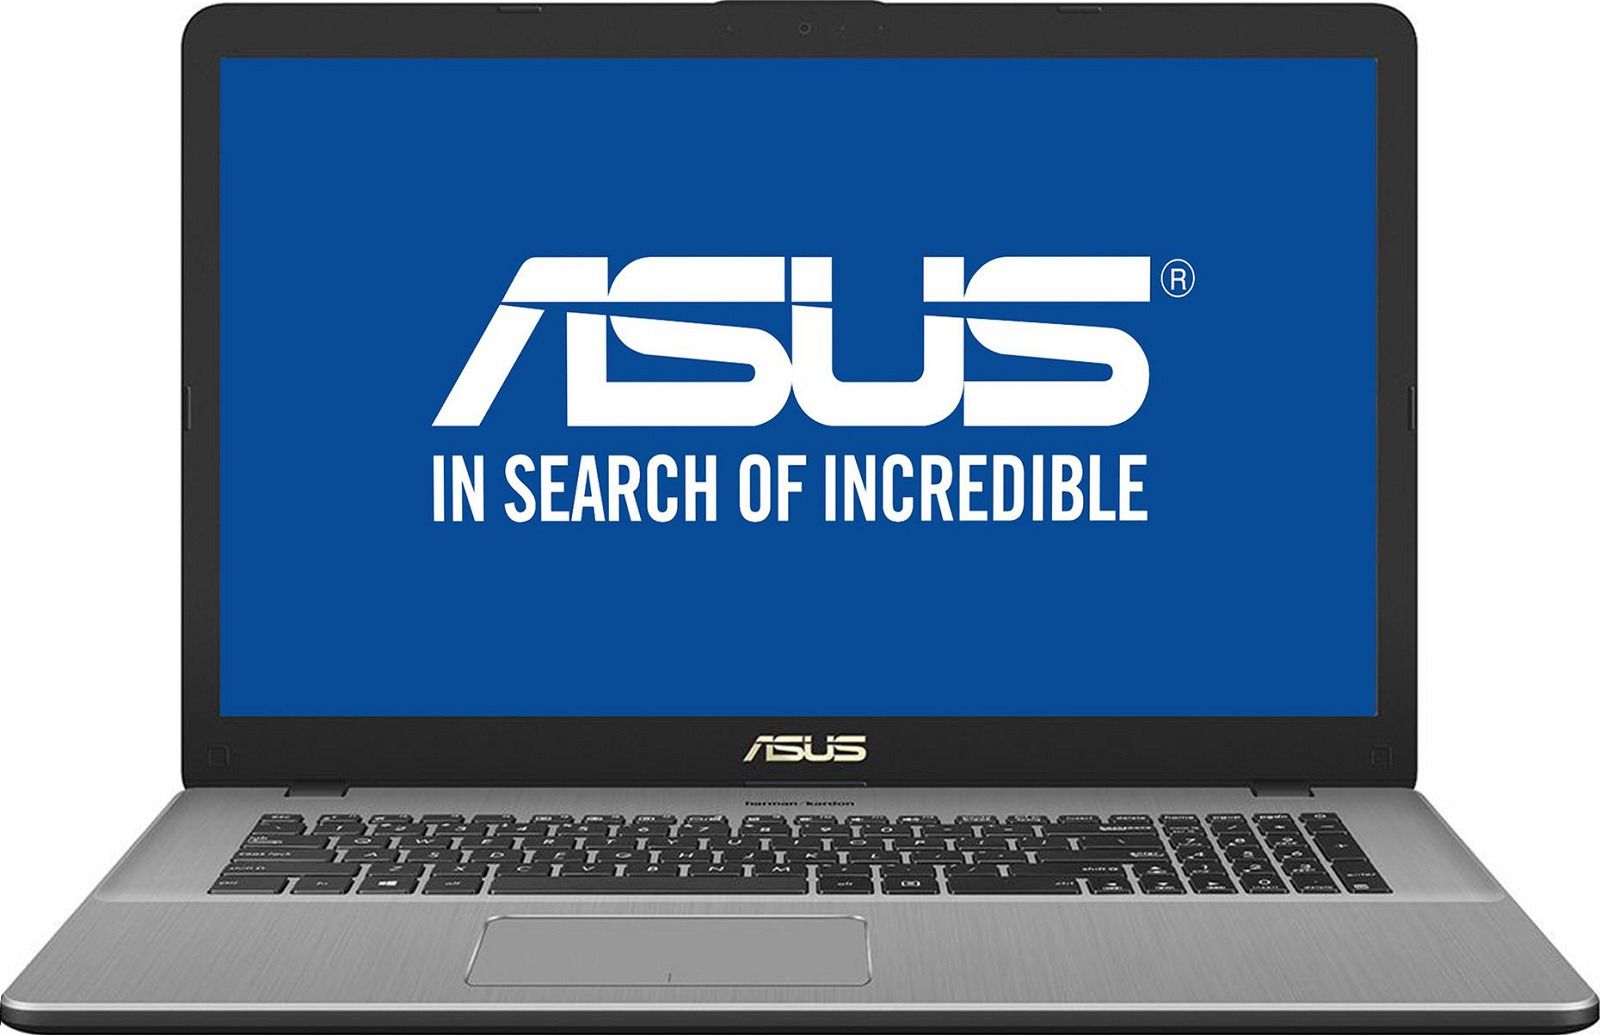 17.3 Ноутбук ASUS VivoBook Pro 17 N705UF 90NB0IE1-M01770, серый ноутбук asus vivobook pro 15 n580gd e4128t 90nb0hx4 m02950